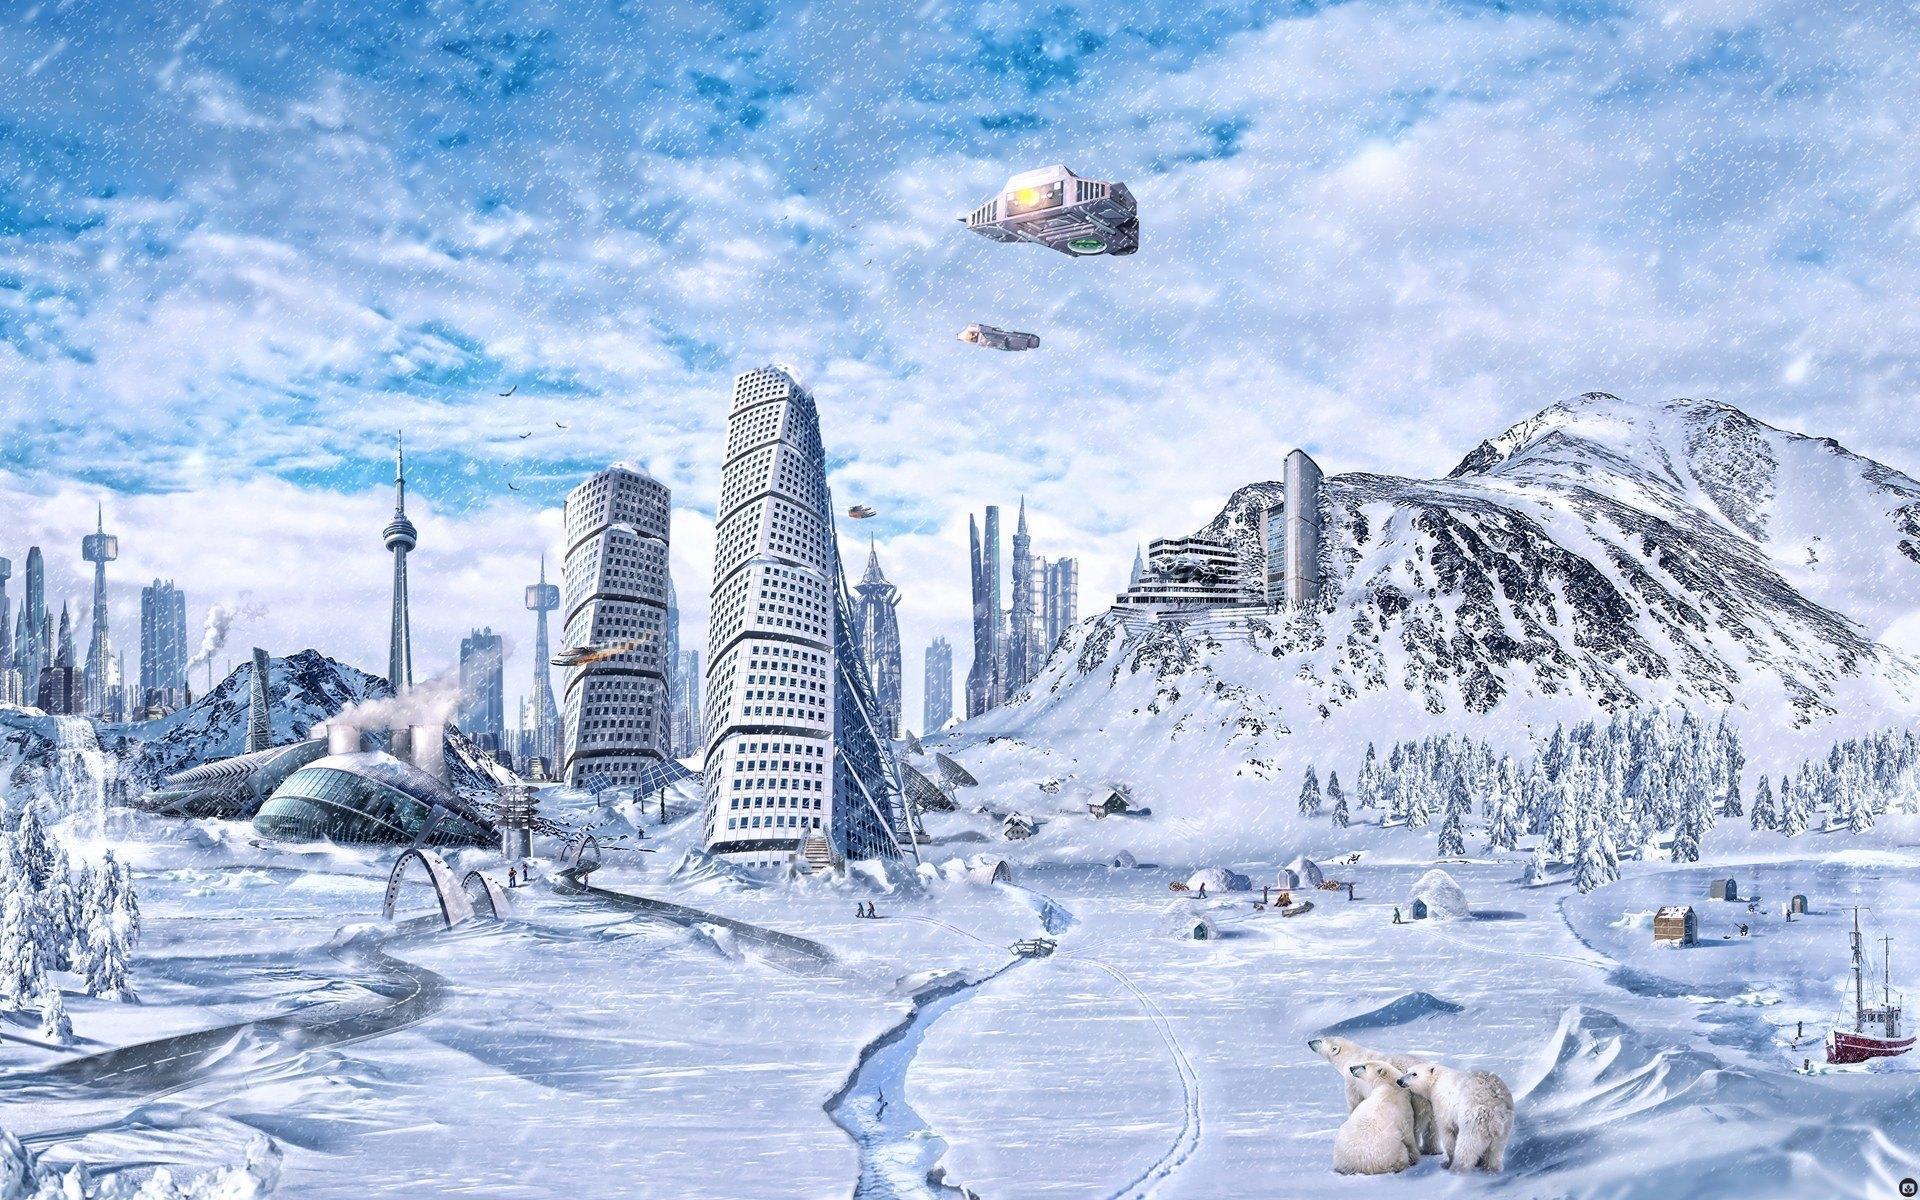 Fantasy Sci Fi Winter Background 1920x1200 1920x1200